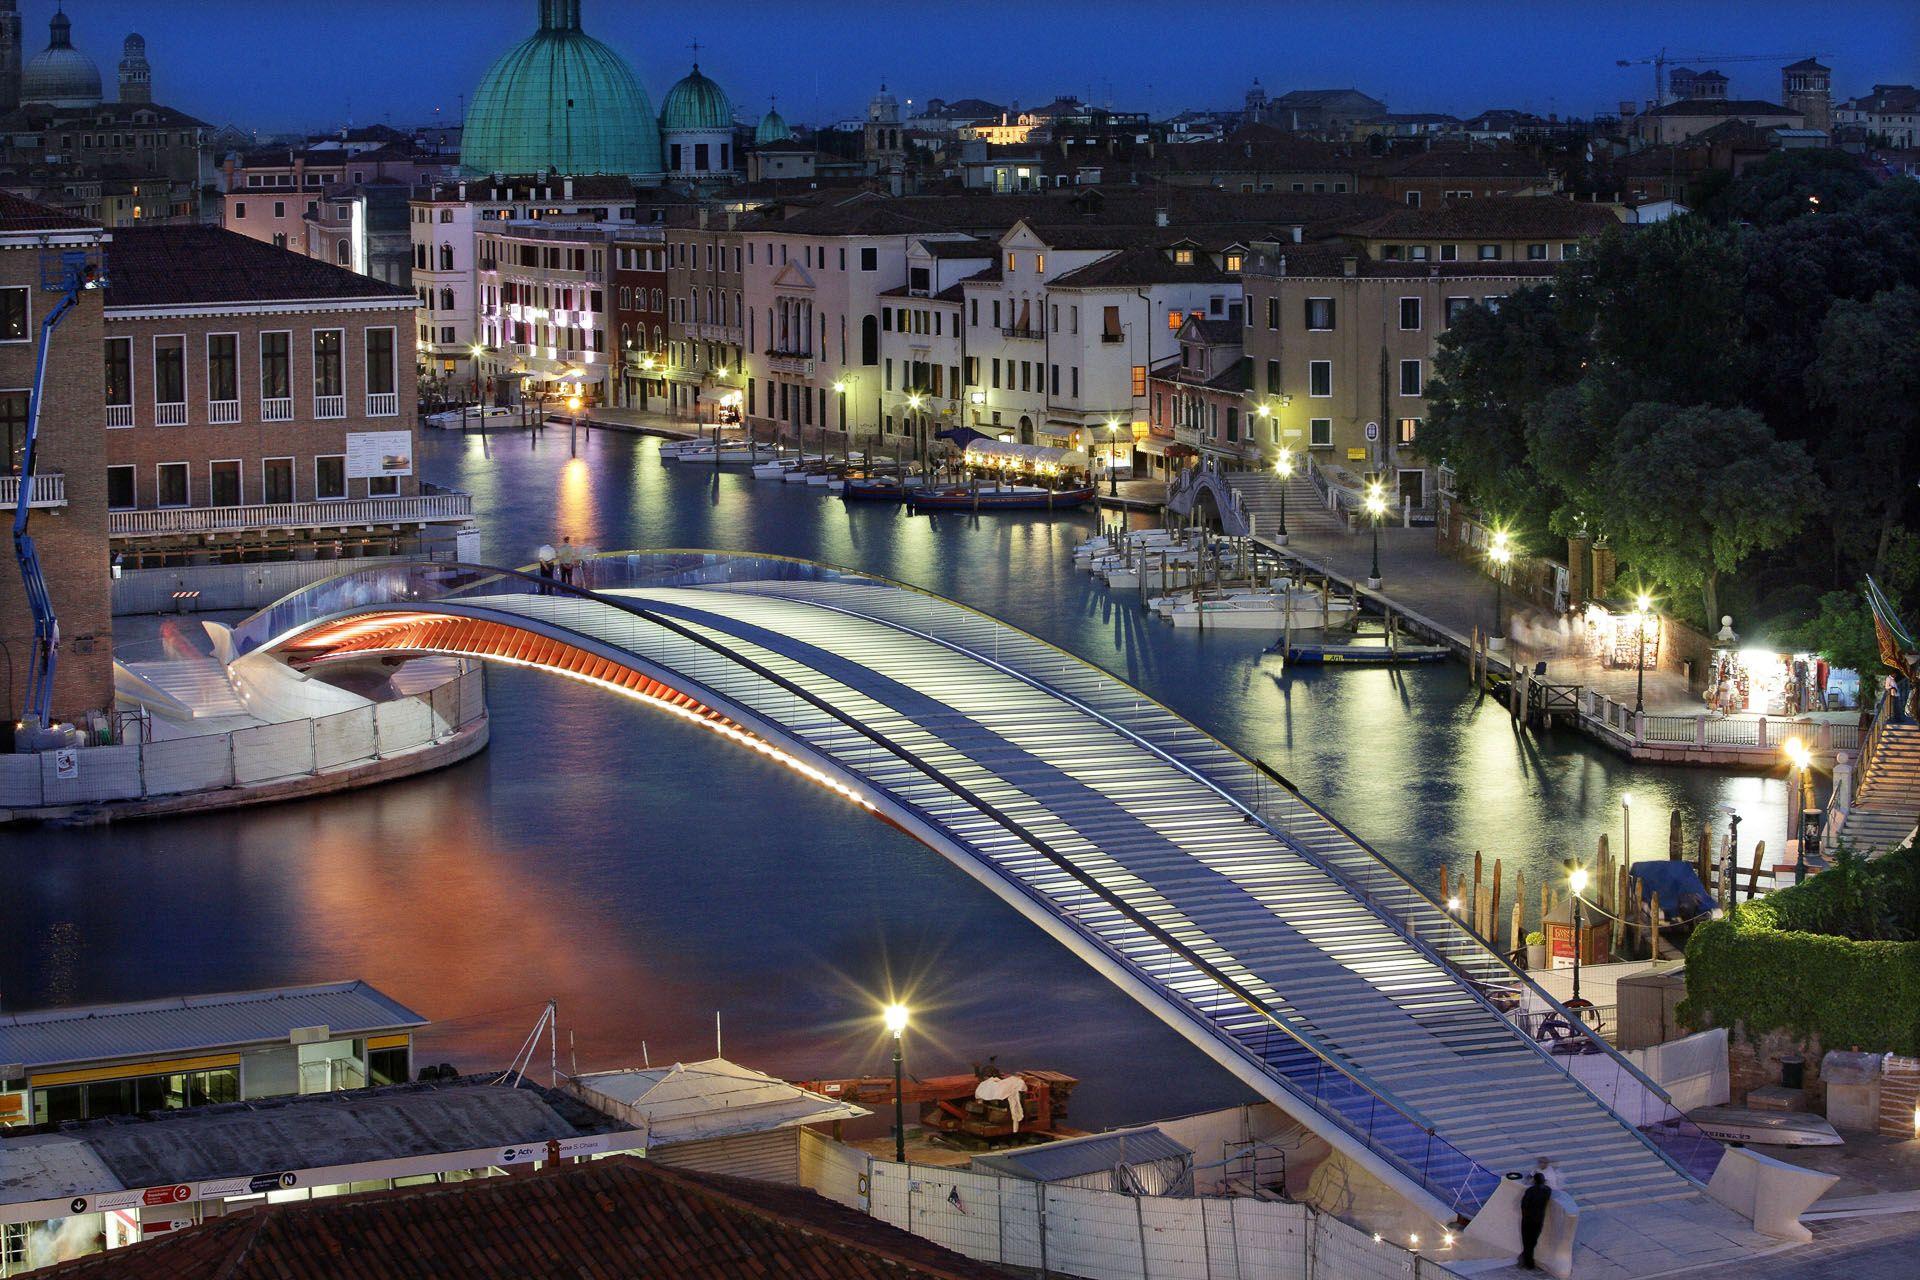 calatrava bridge venice photos - photo#24